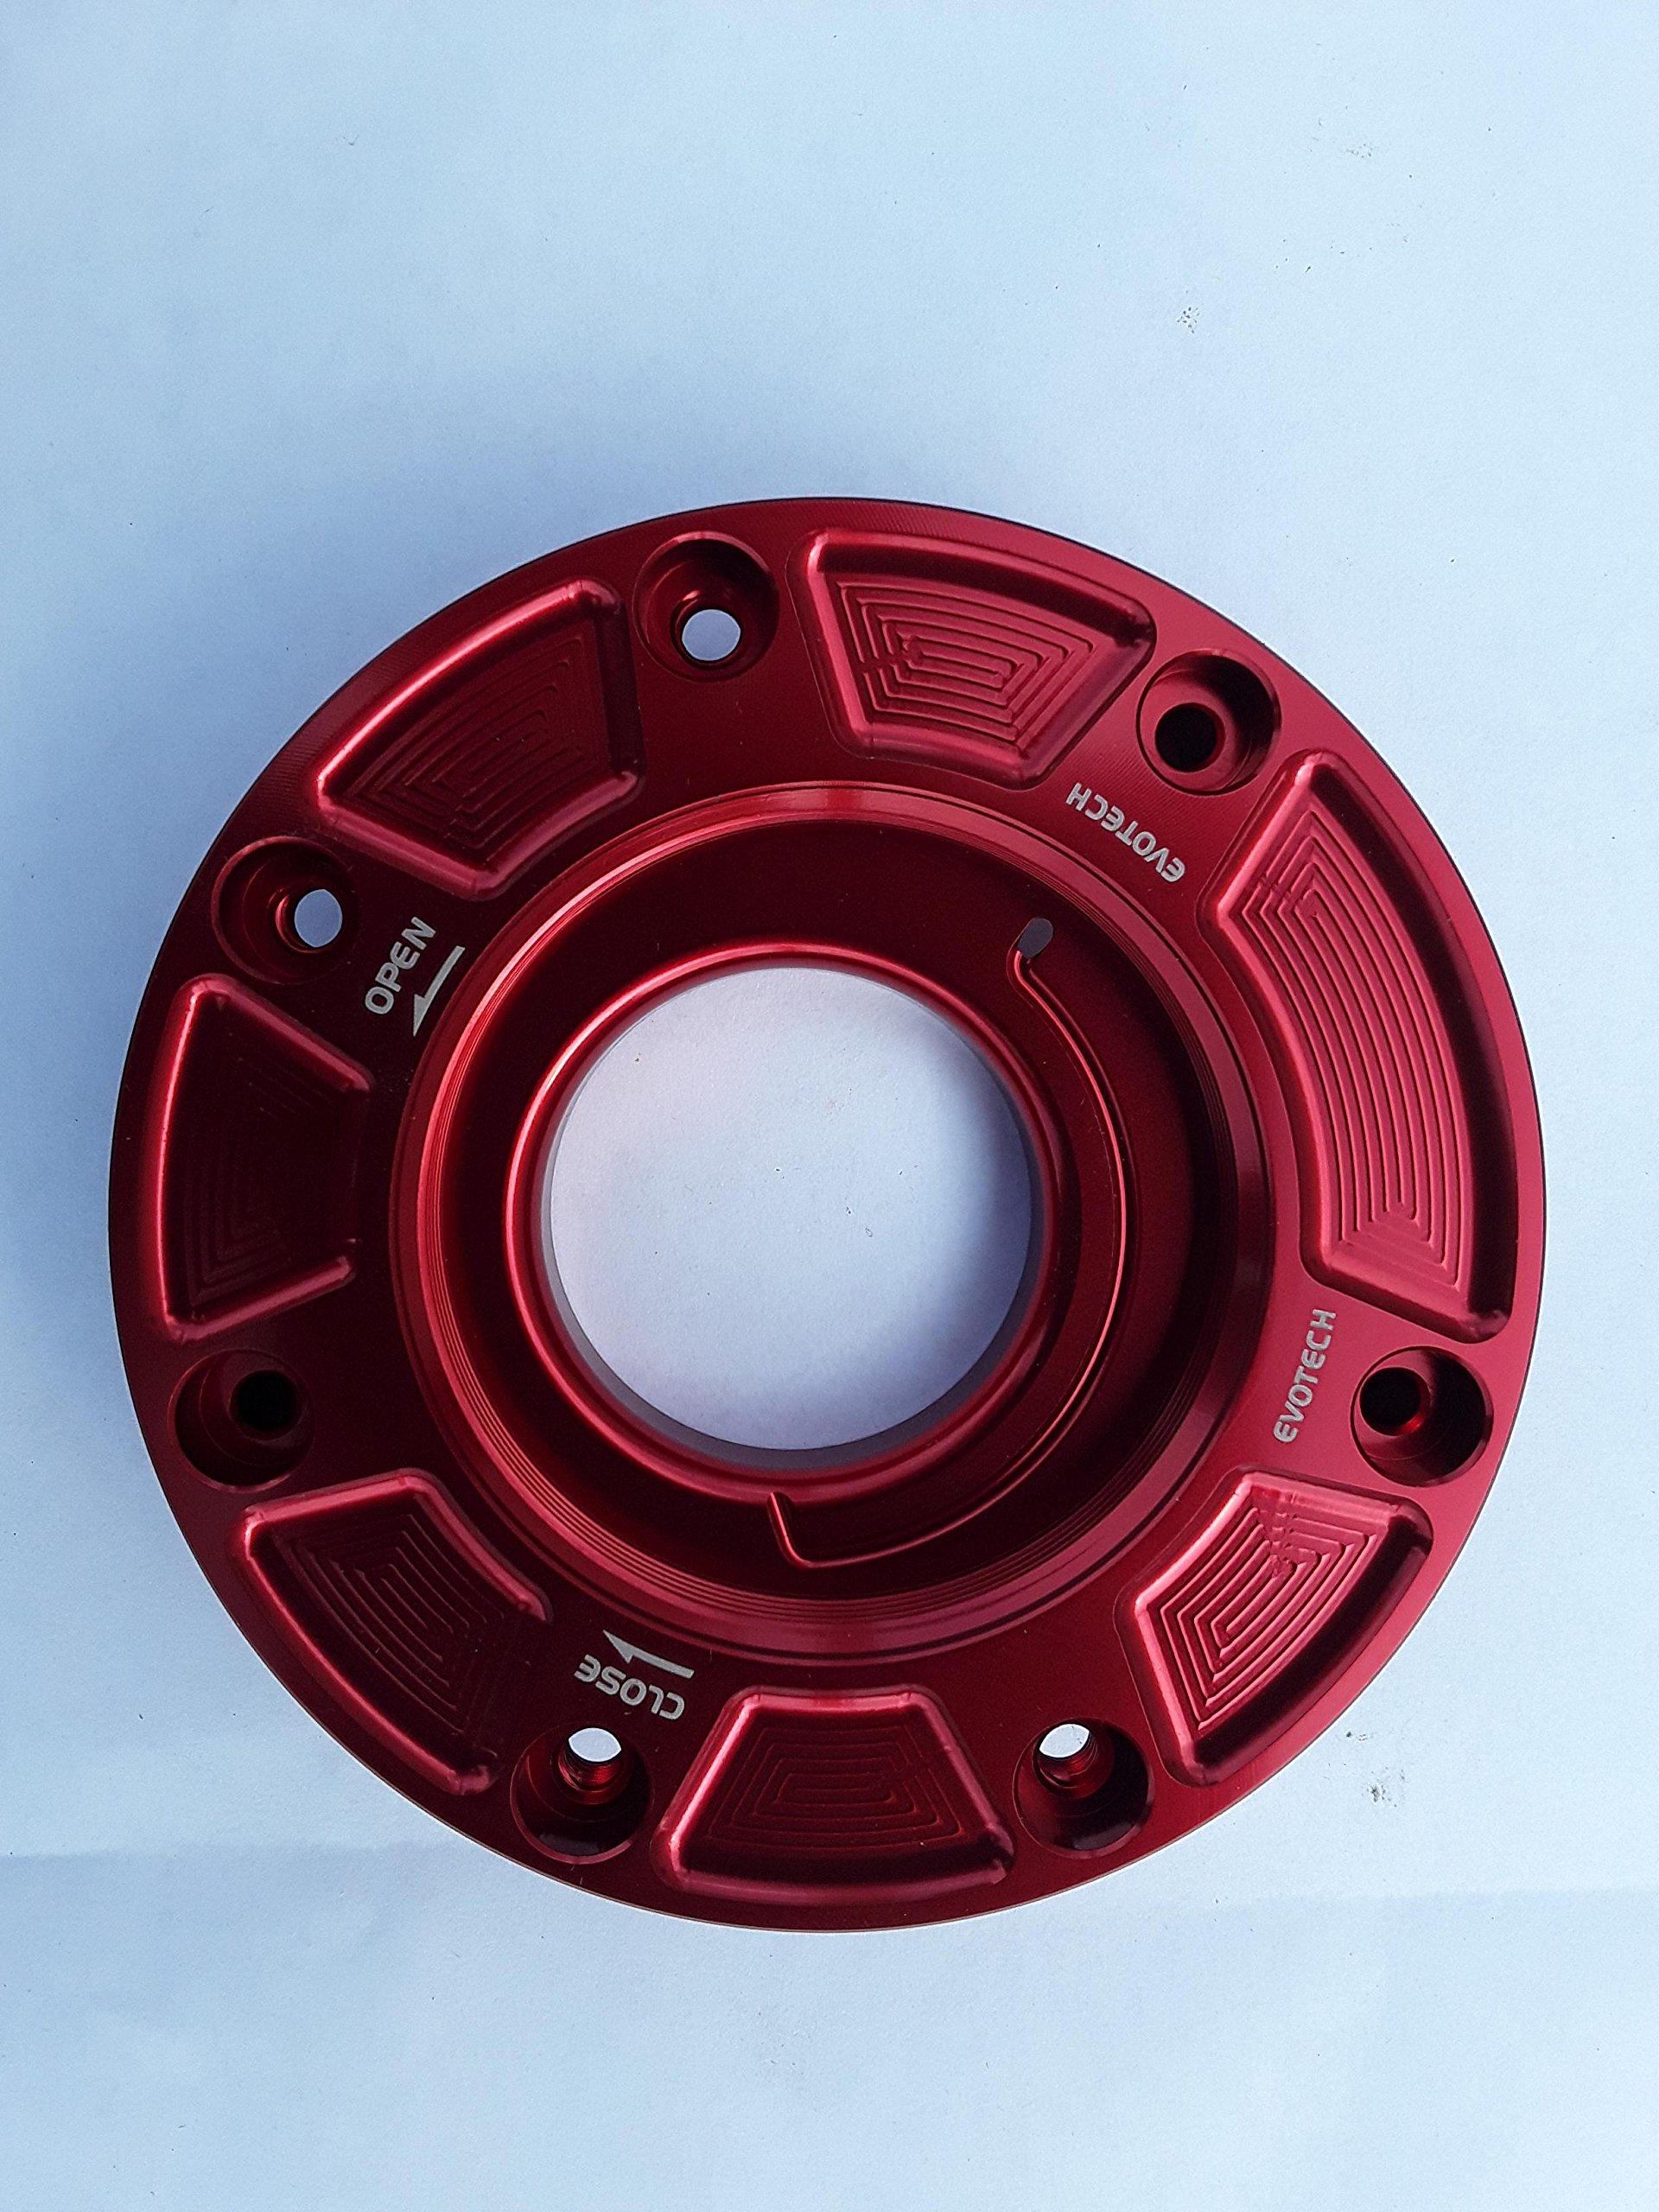 Evotech Full Turn Gas Cap Bases for most older Kawasaki Sportbikes FC-KA1 Cherry Red